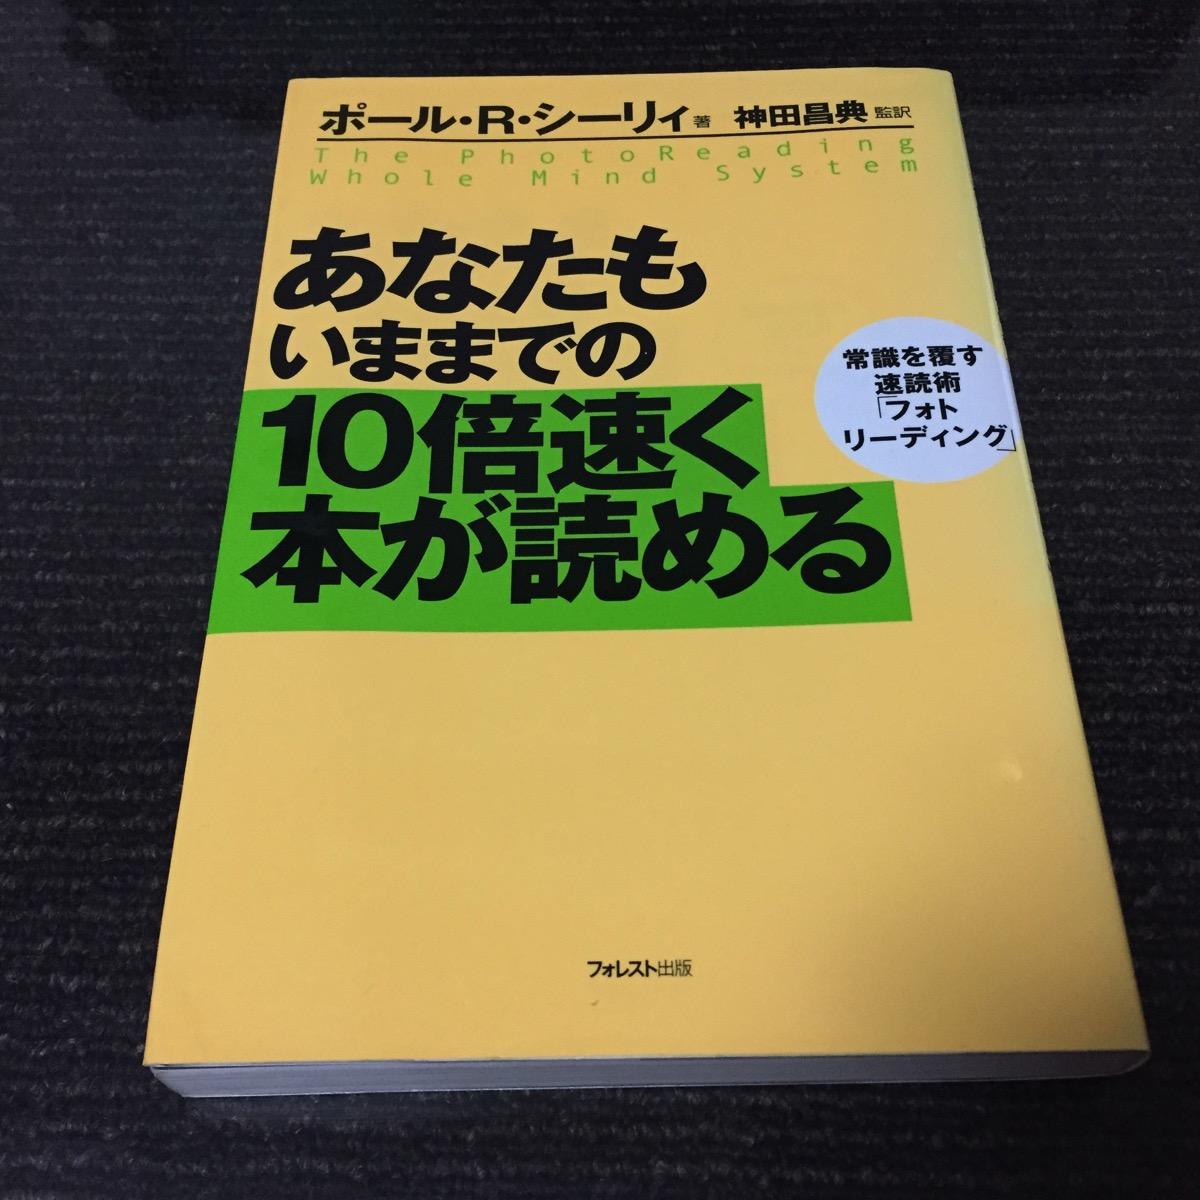 IMG 1161